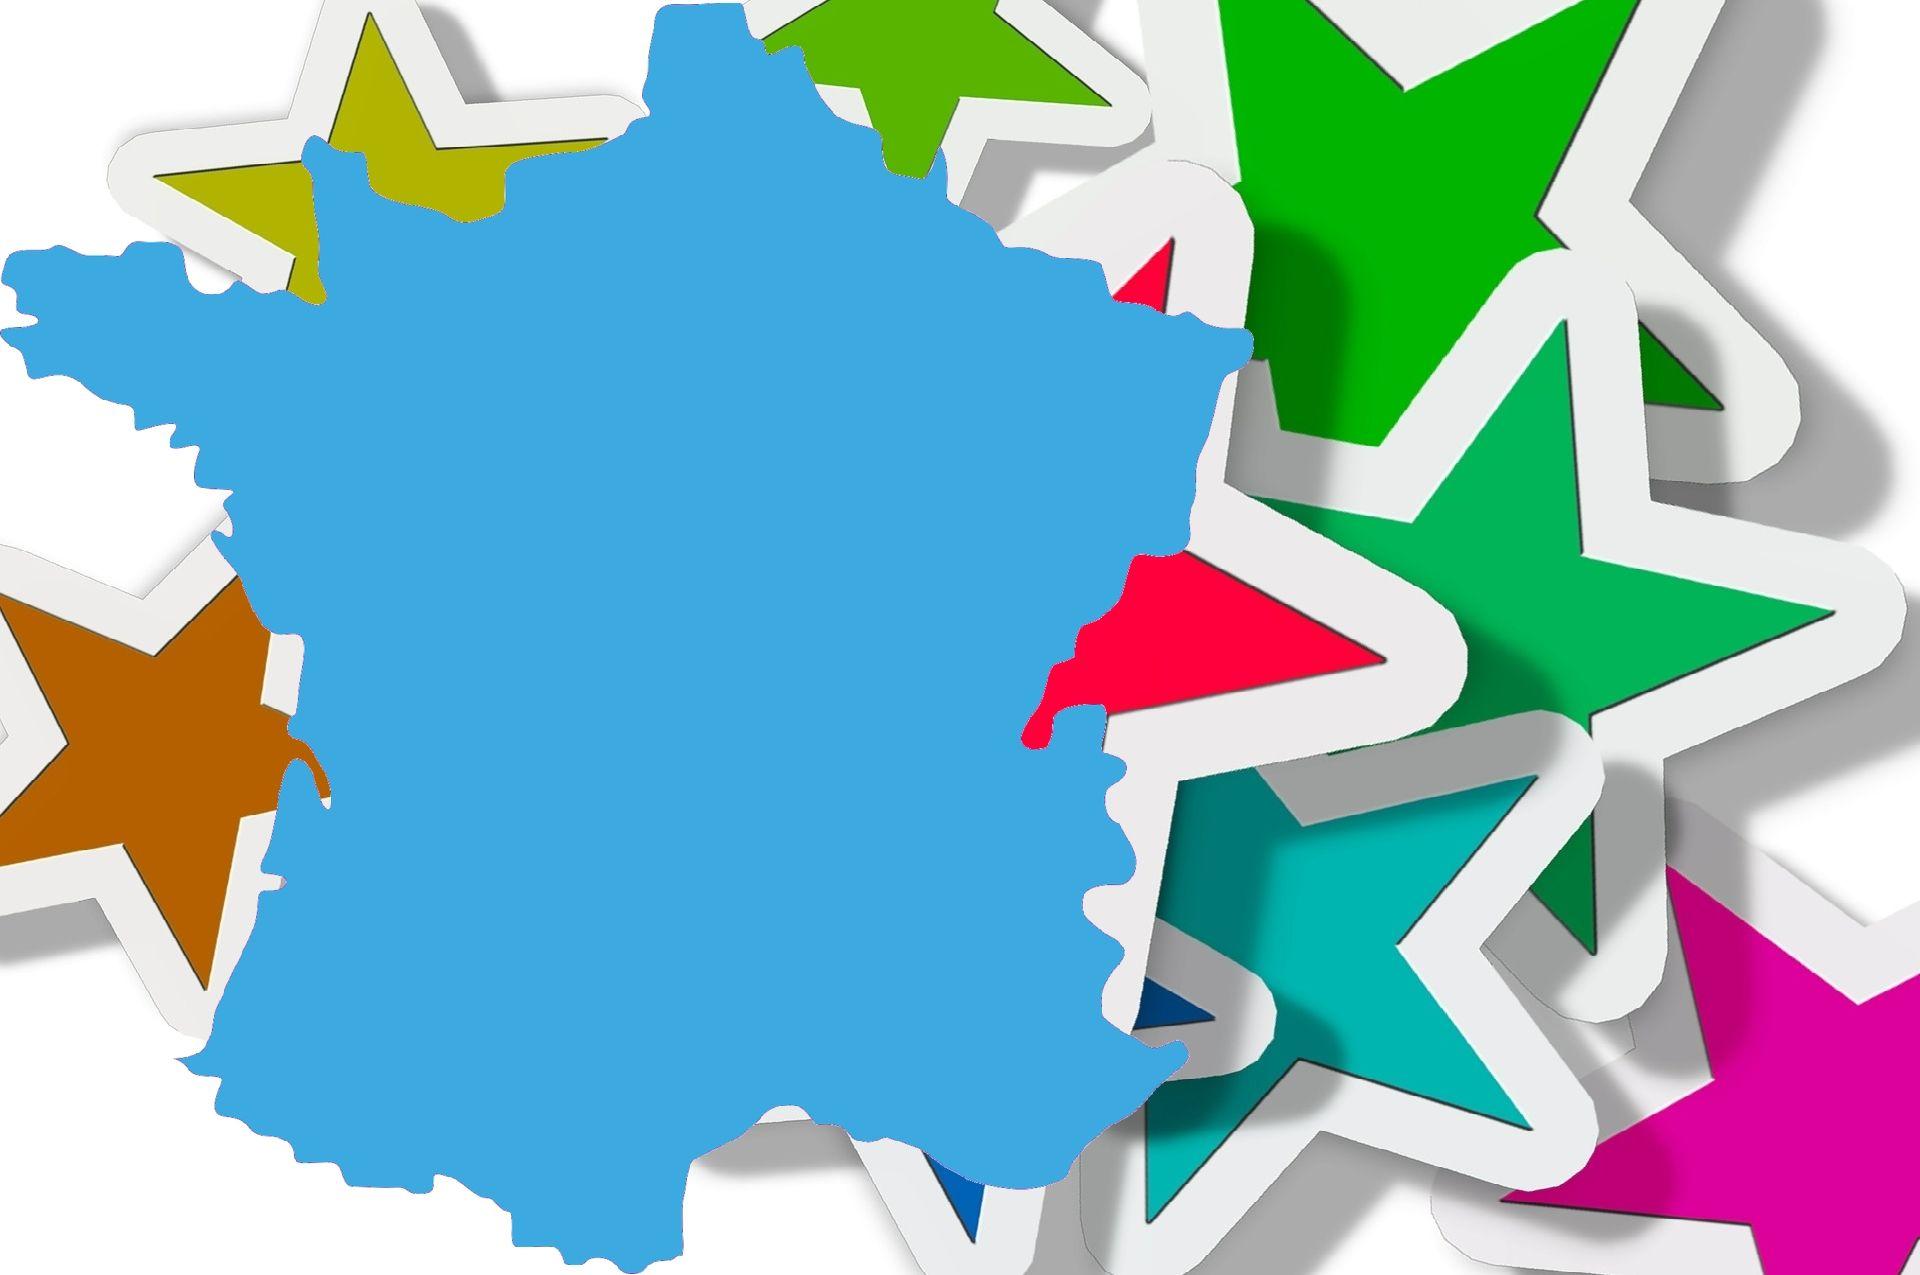 FRANCE TOP 10 VENTE DIRECTE